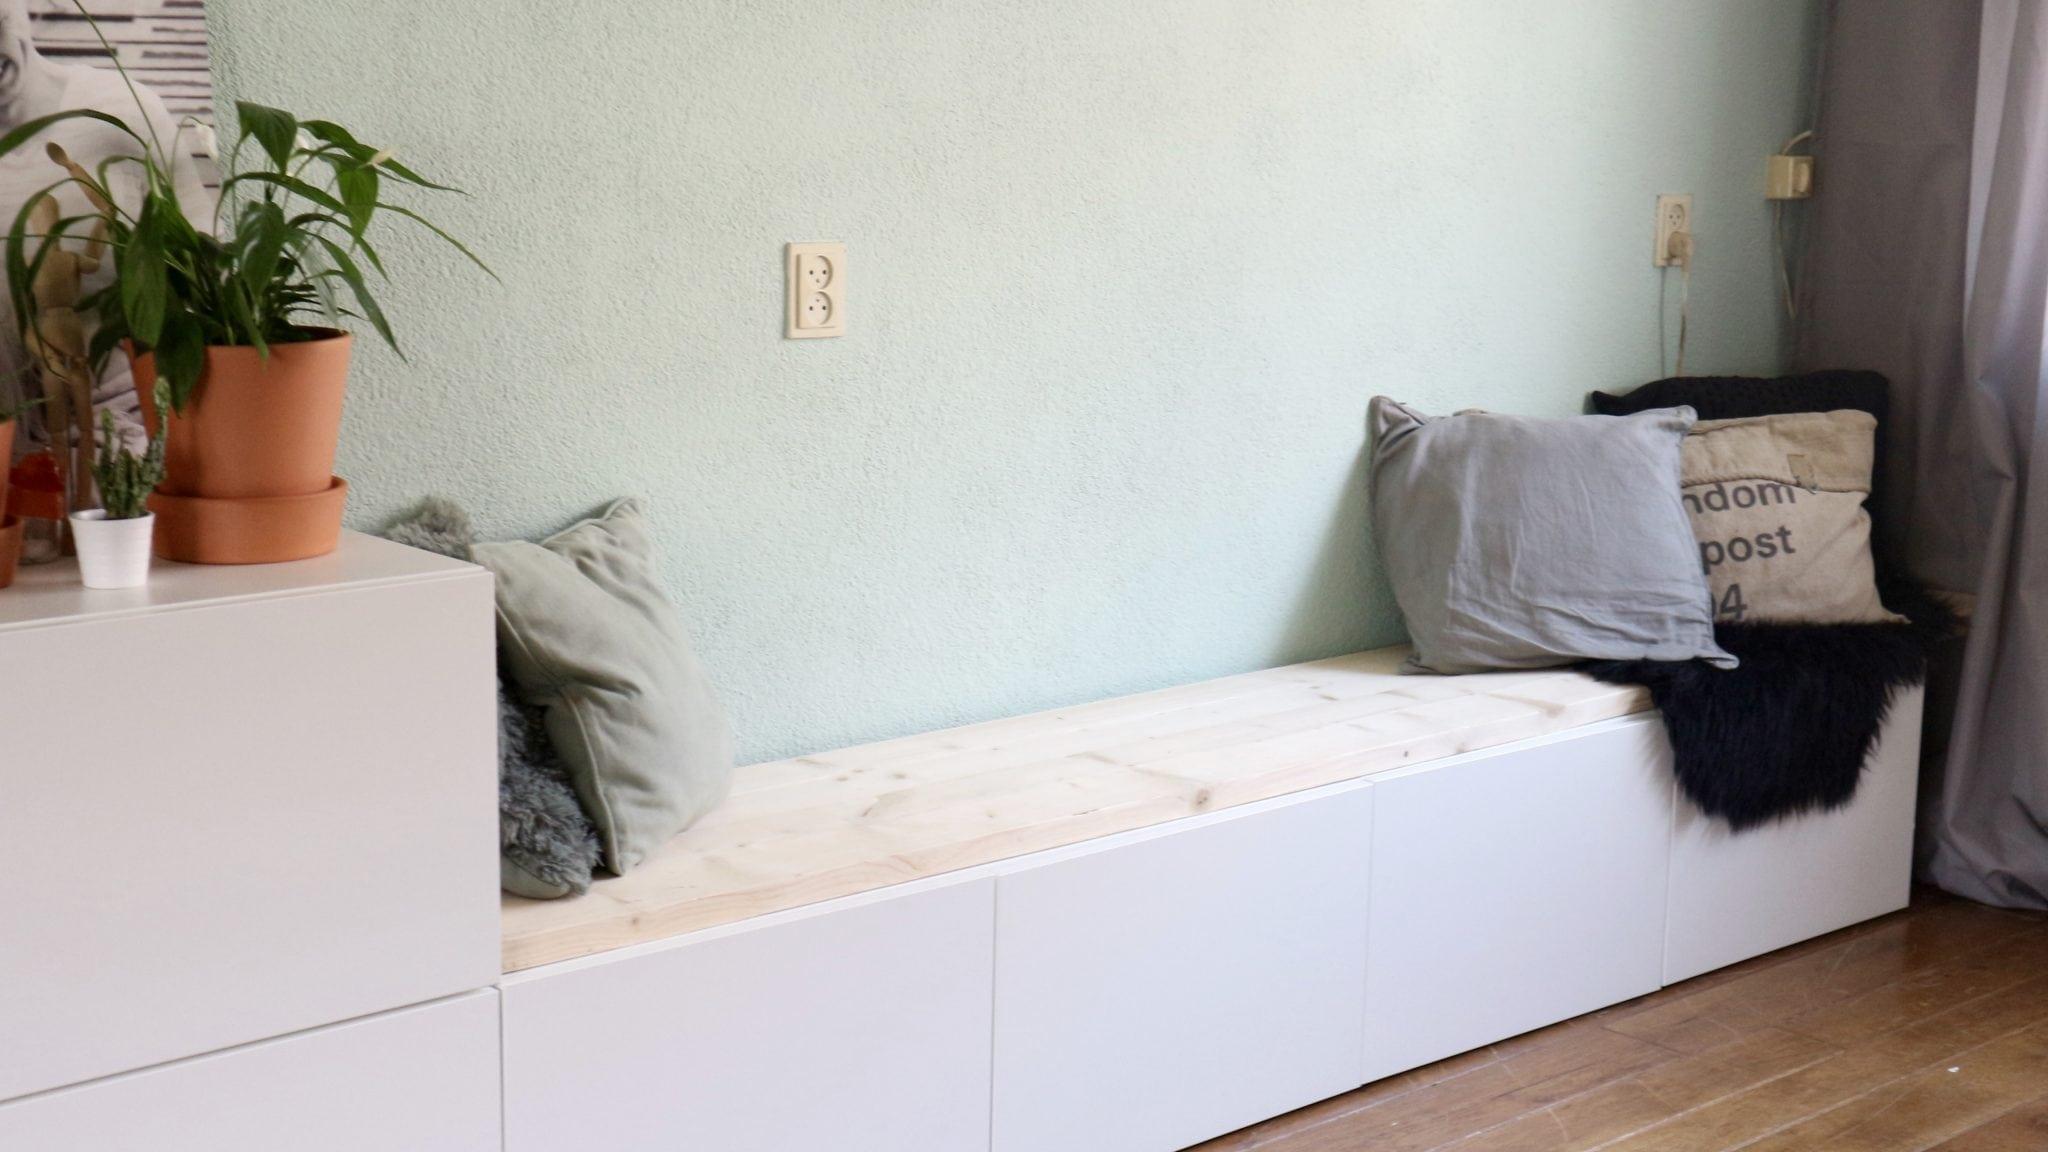 Zwevende Plank Tv Meubel.Ikea Zwevende Plank Beautiful Zwevende Planken Bij Ikea With Ikea